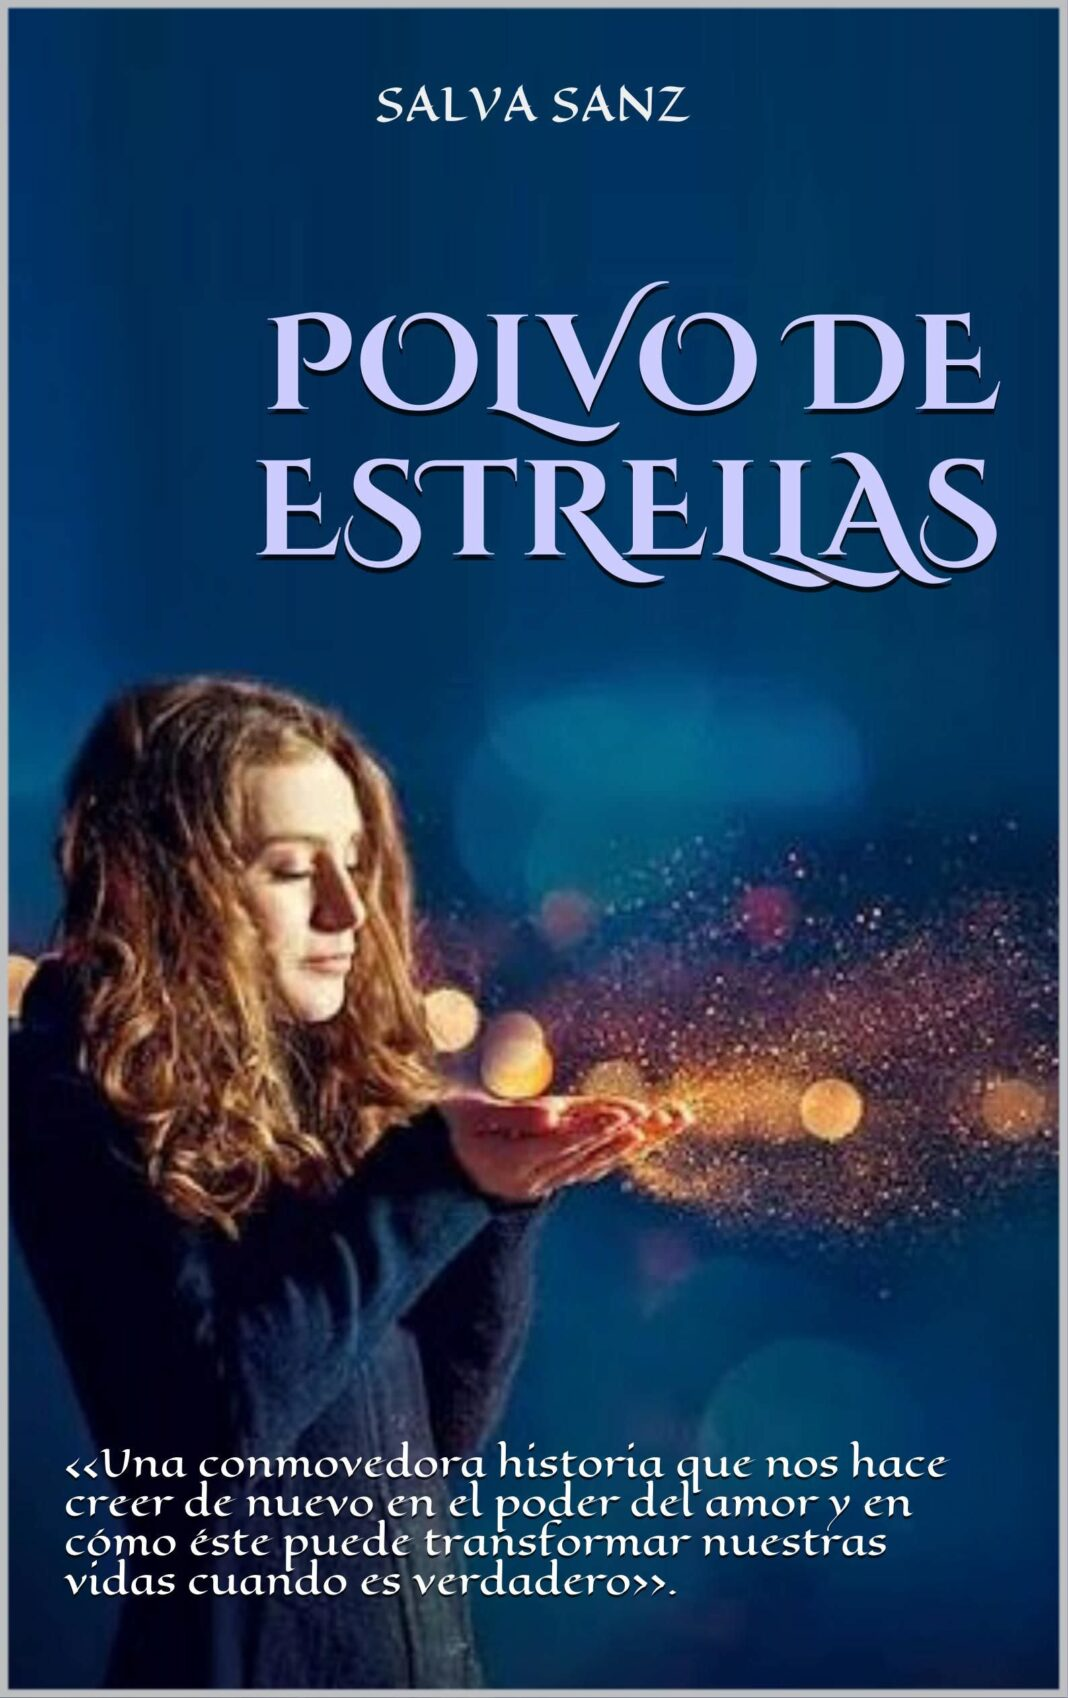 Recomendación literaria: Polvo de estrellas (Salva Sanz)